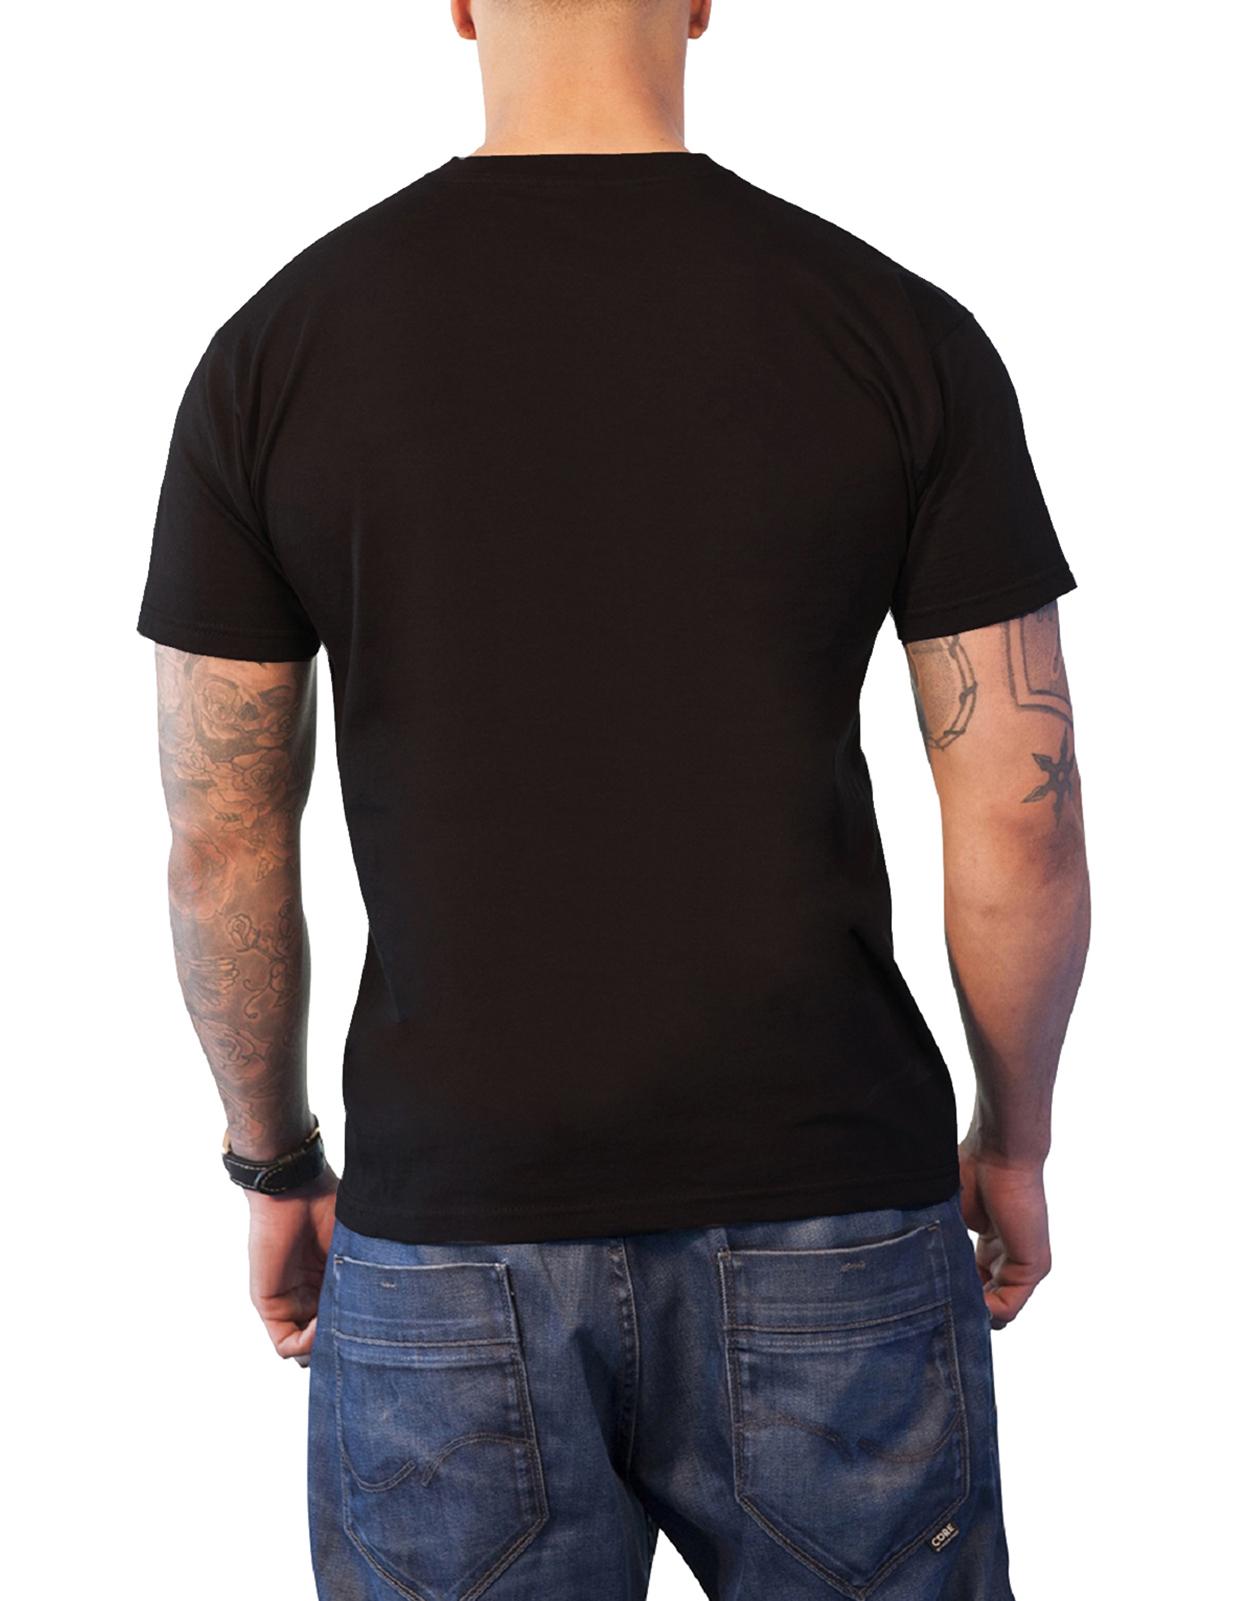 Motorhead-T-Shirt-Lemmy-RIP-England-warpig-clean-your-clock-official-new-mens Indexbild 41